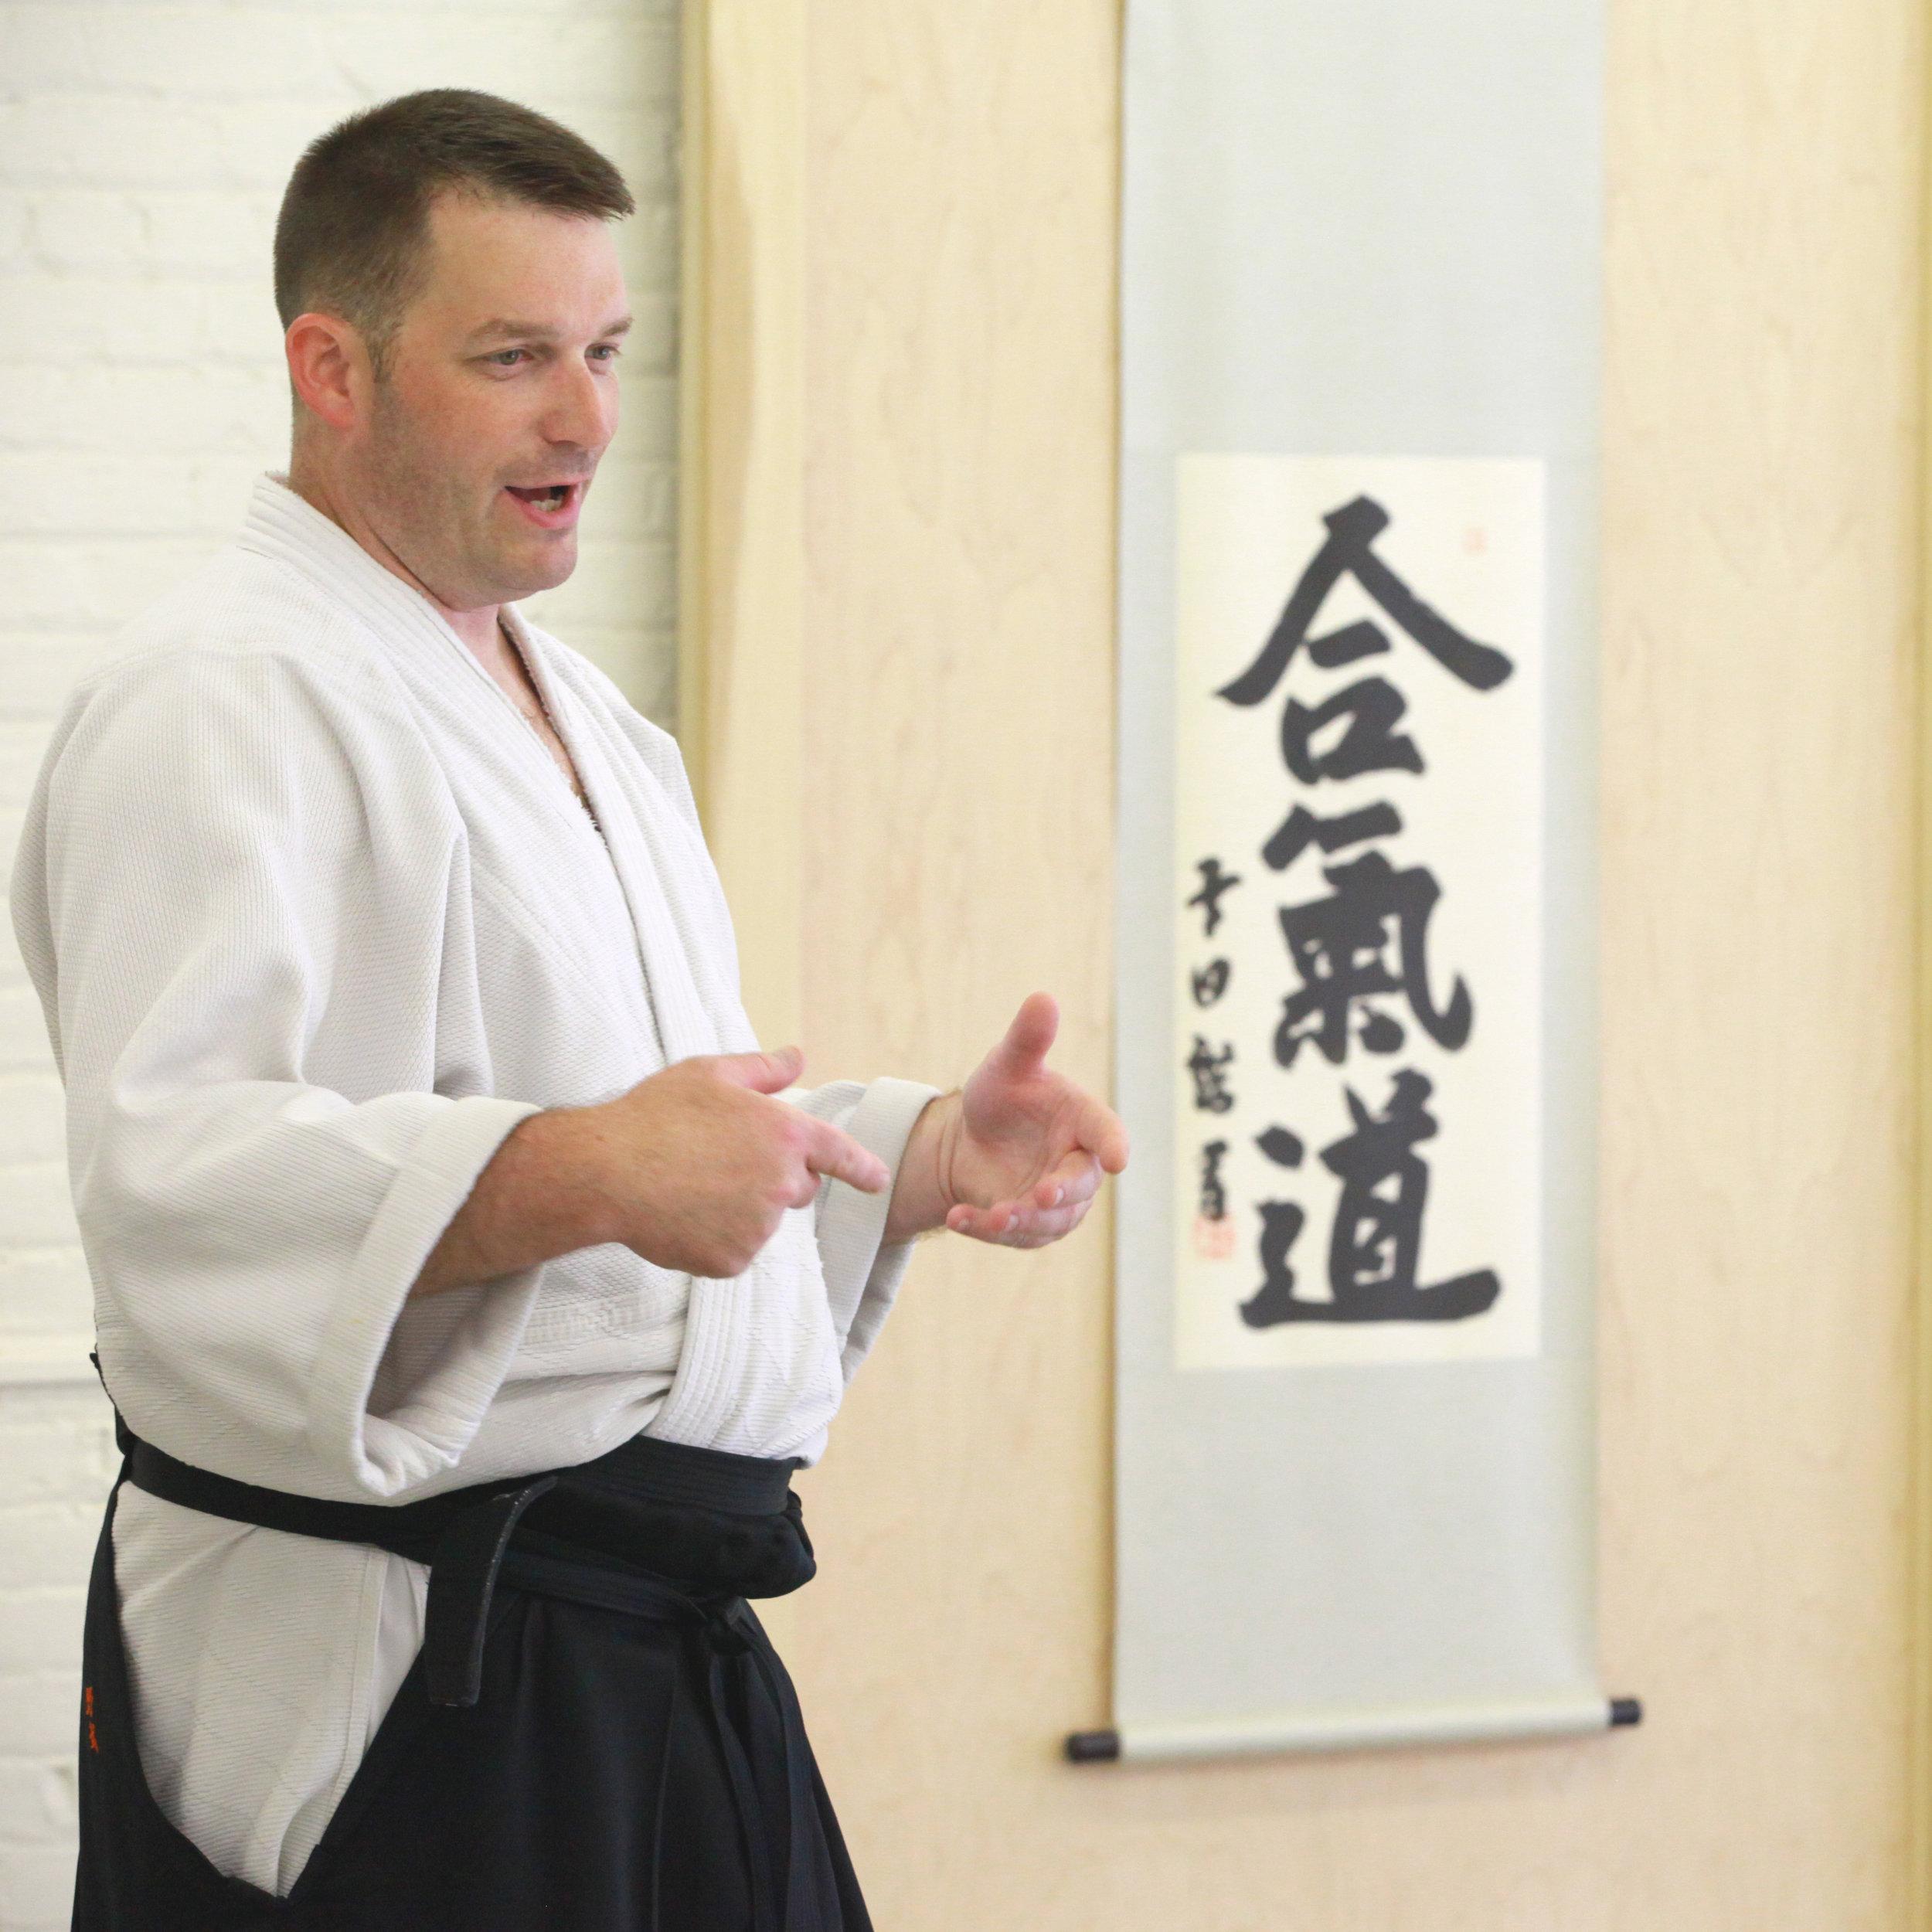 Noble Sensei teaching at an Aikido workshop in Brooklyn, New York